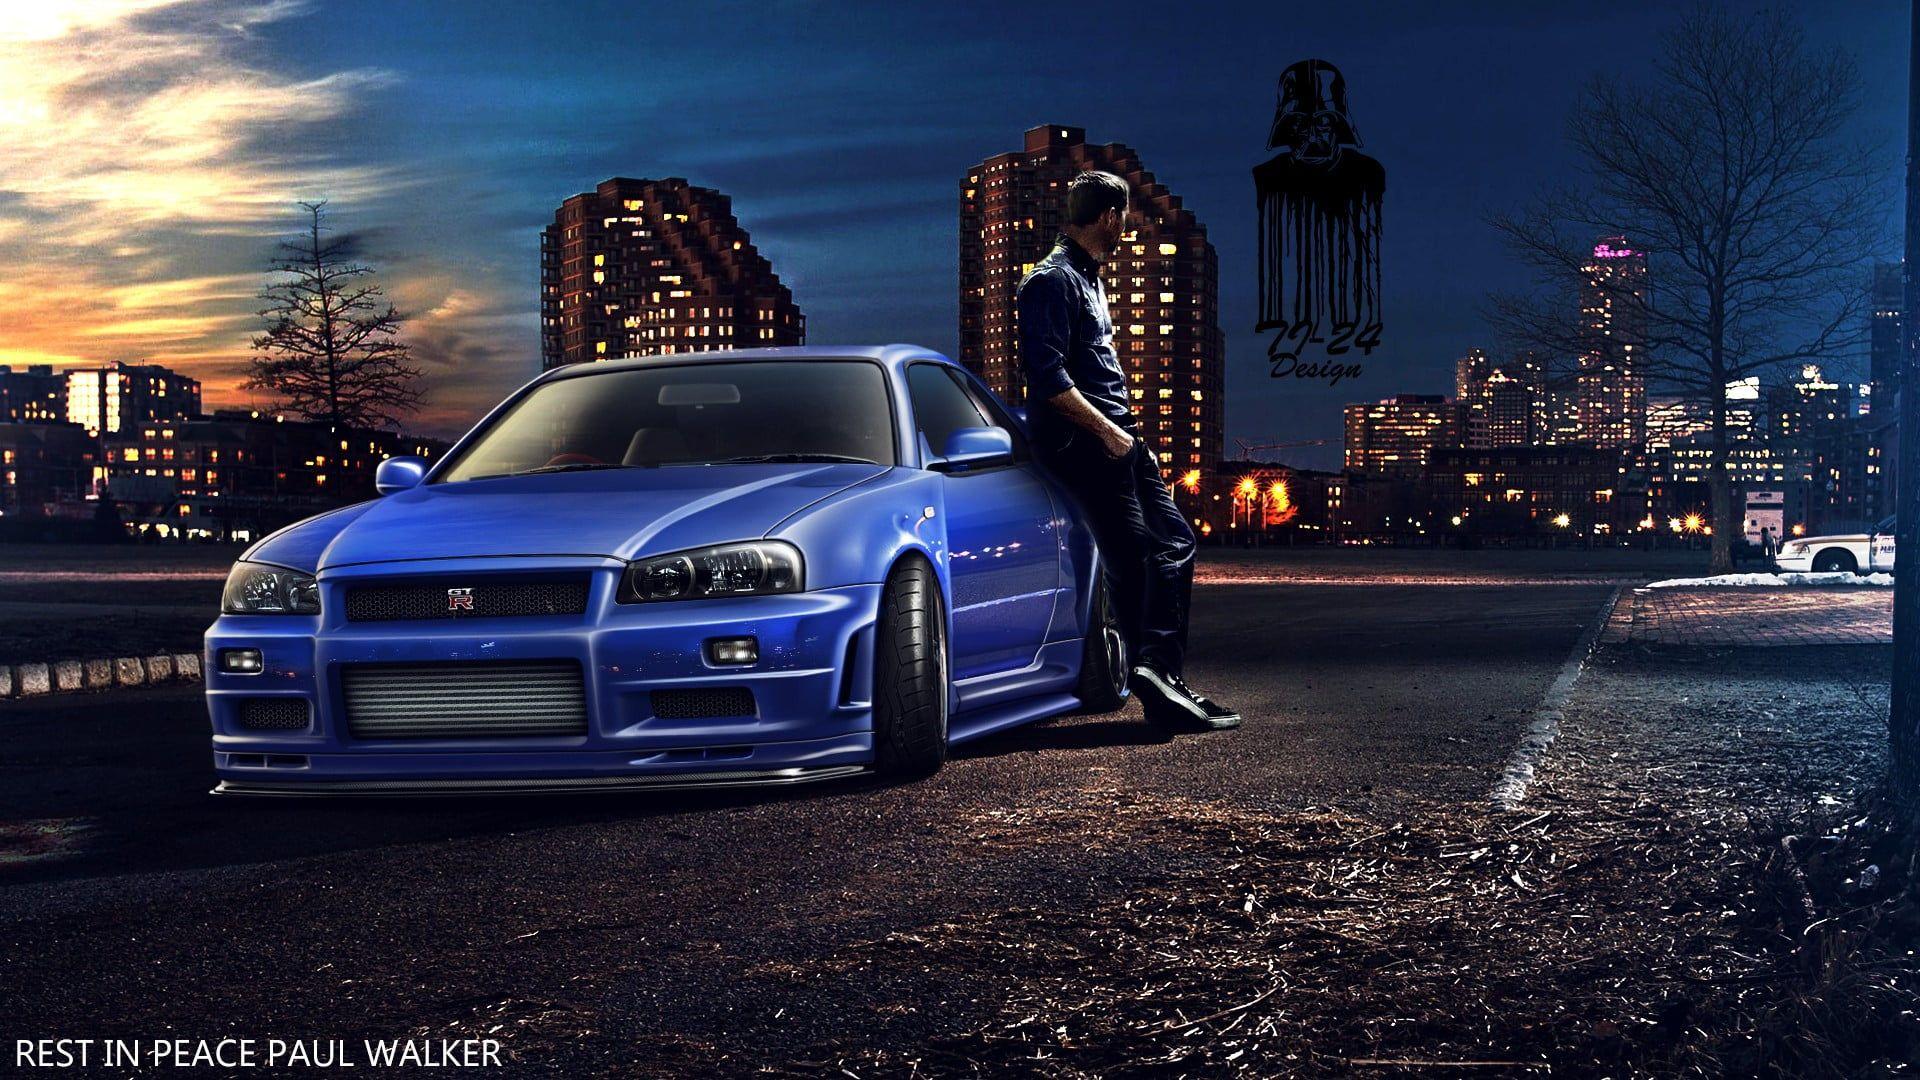 Blue Nissan Skyline R34 Paul Walker Fast And Furious Furious 7 Nissan Skyline Gt R R34 Car 1080p In 2020 Nissan Gtr Skyline Nissan Skyline Gt Nissan Gtr Wallpapers